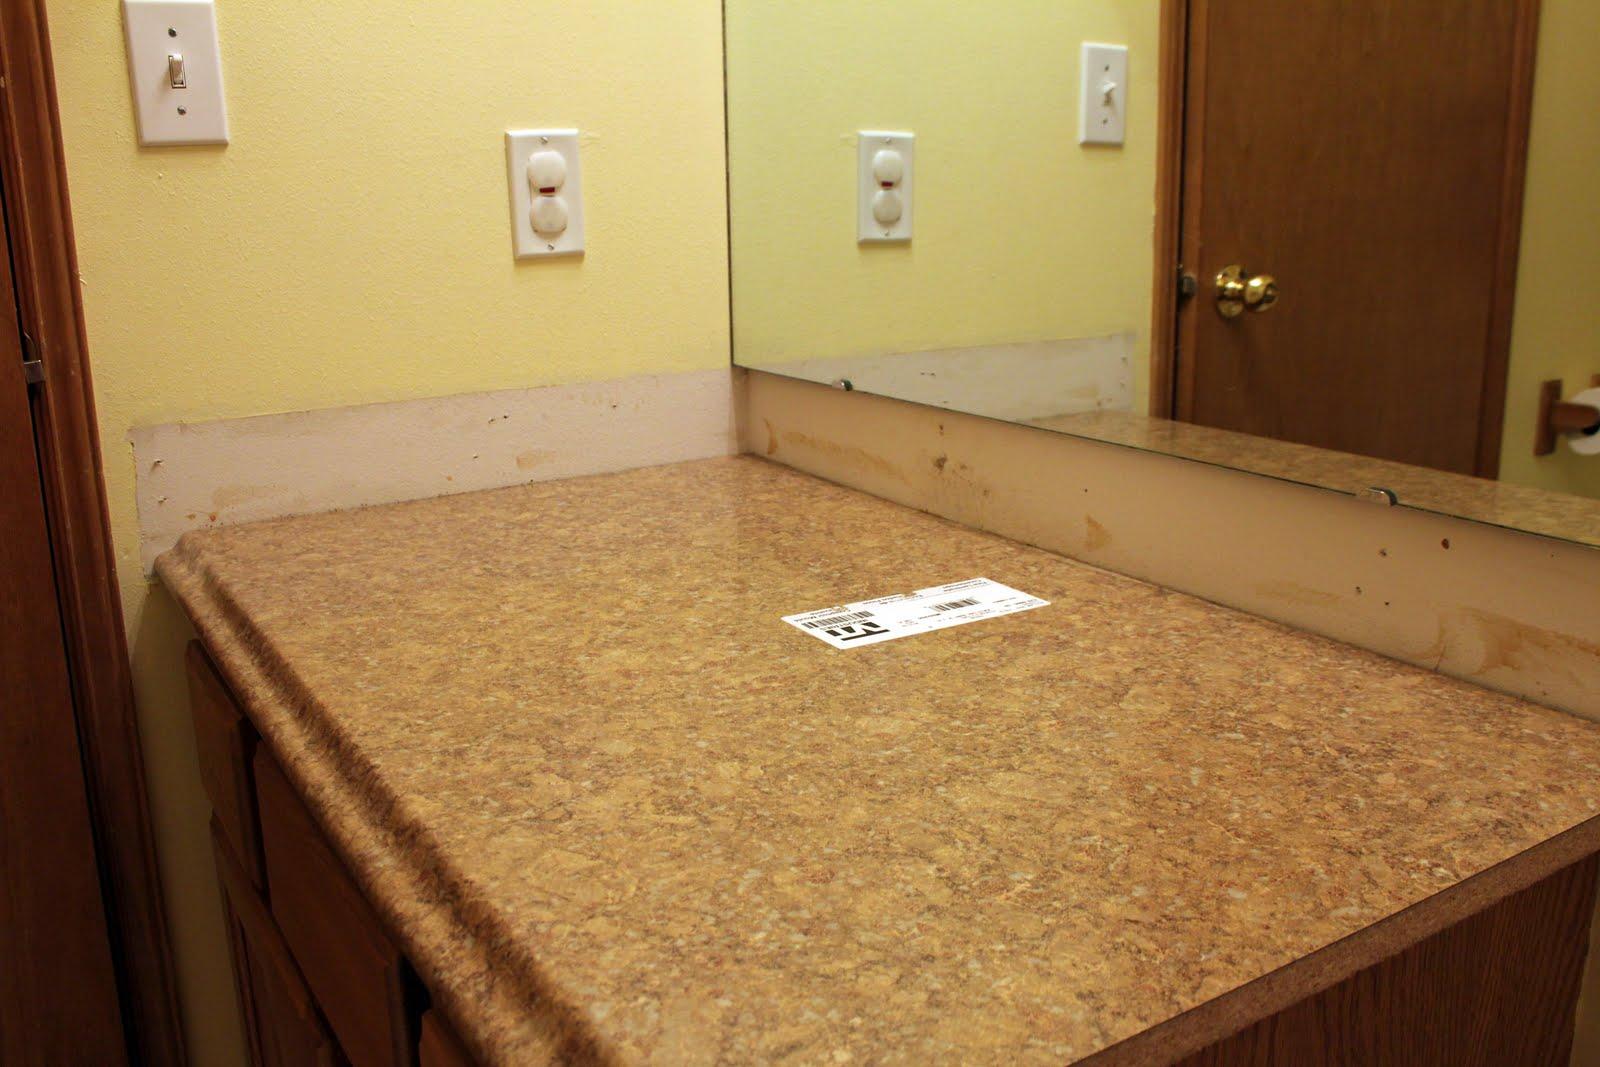 Kitchen Countertops Without Backsplash Laminate Countertops Without Backsplash